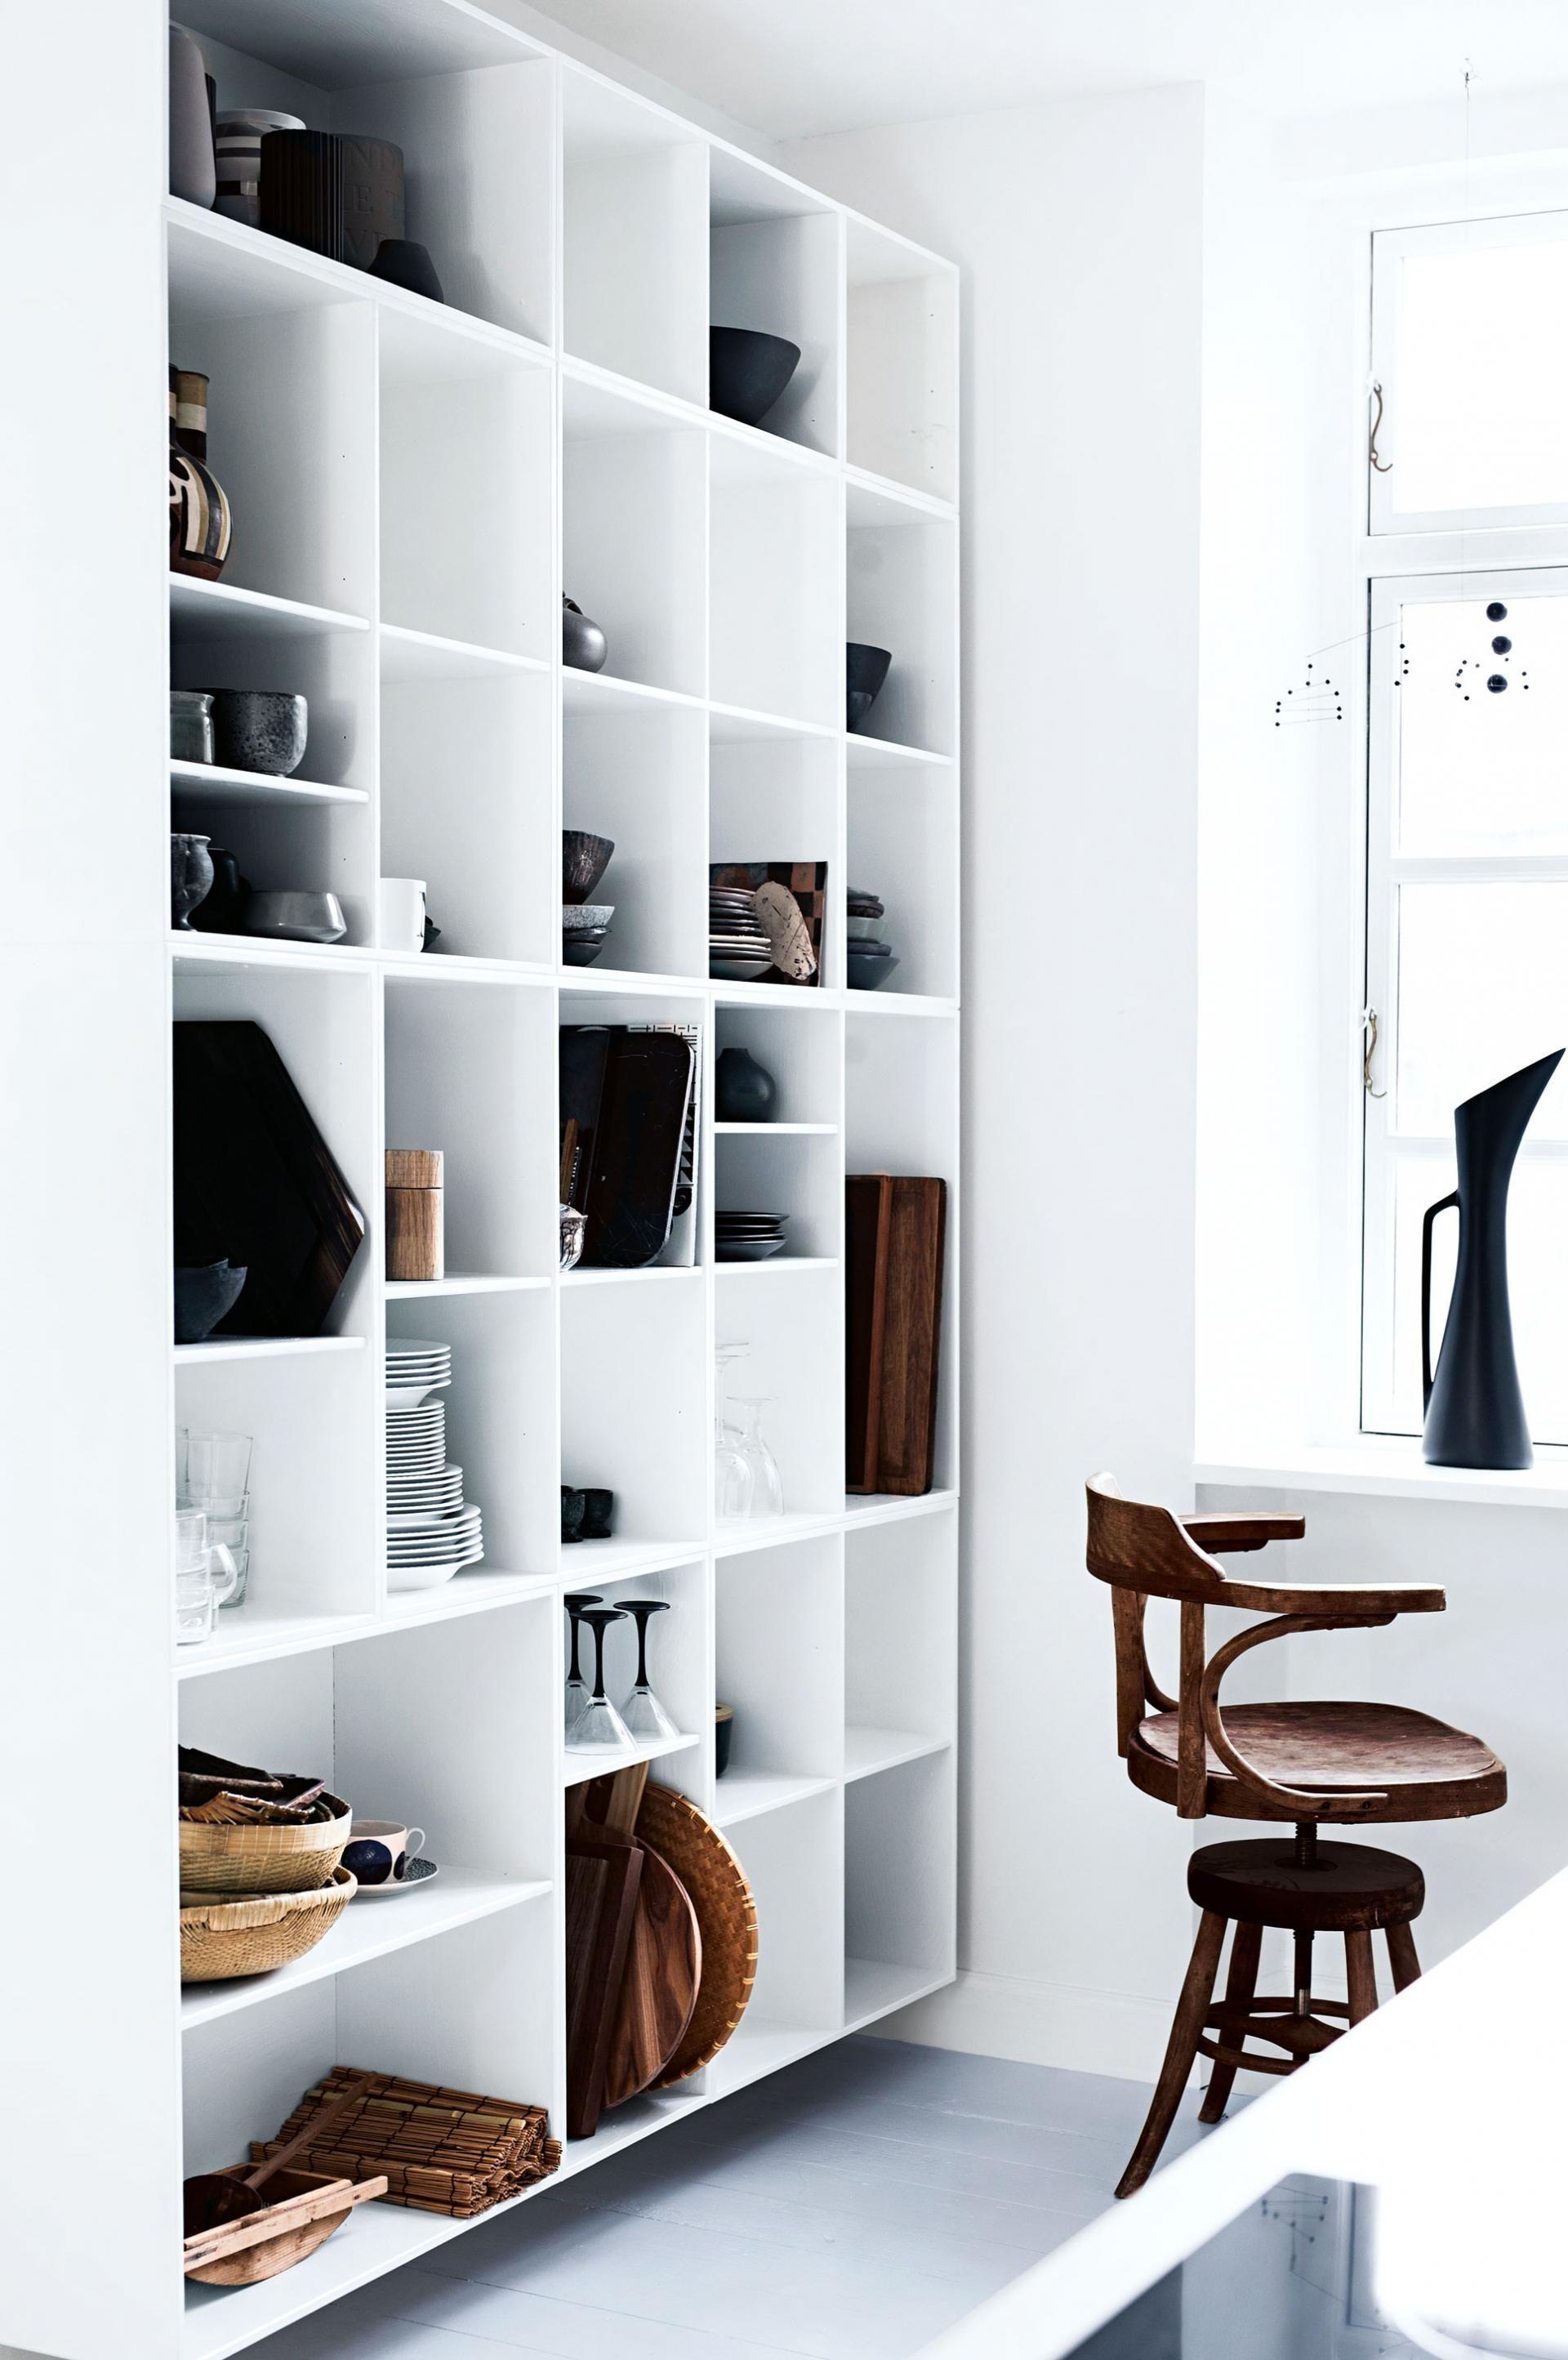 White open shelving in kitchen 월 pinterest open shelving box